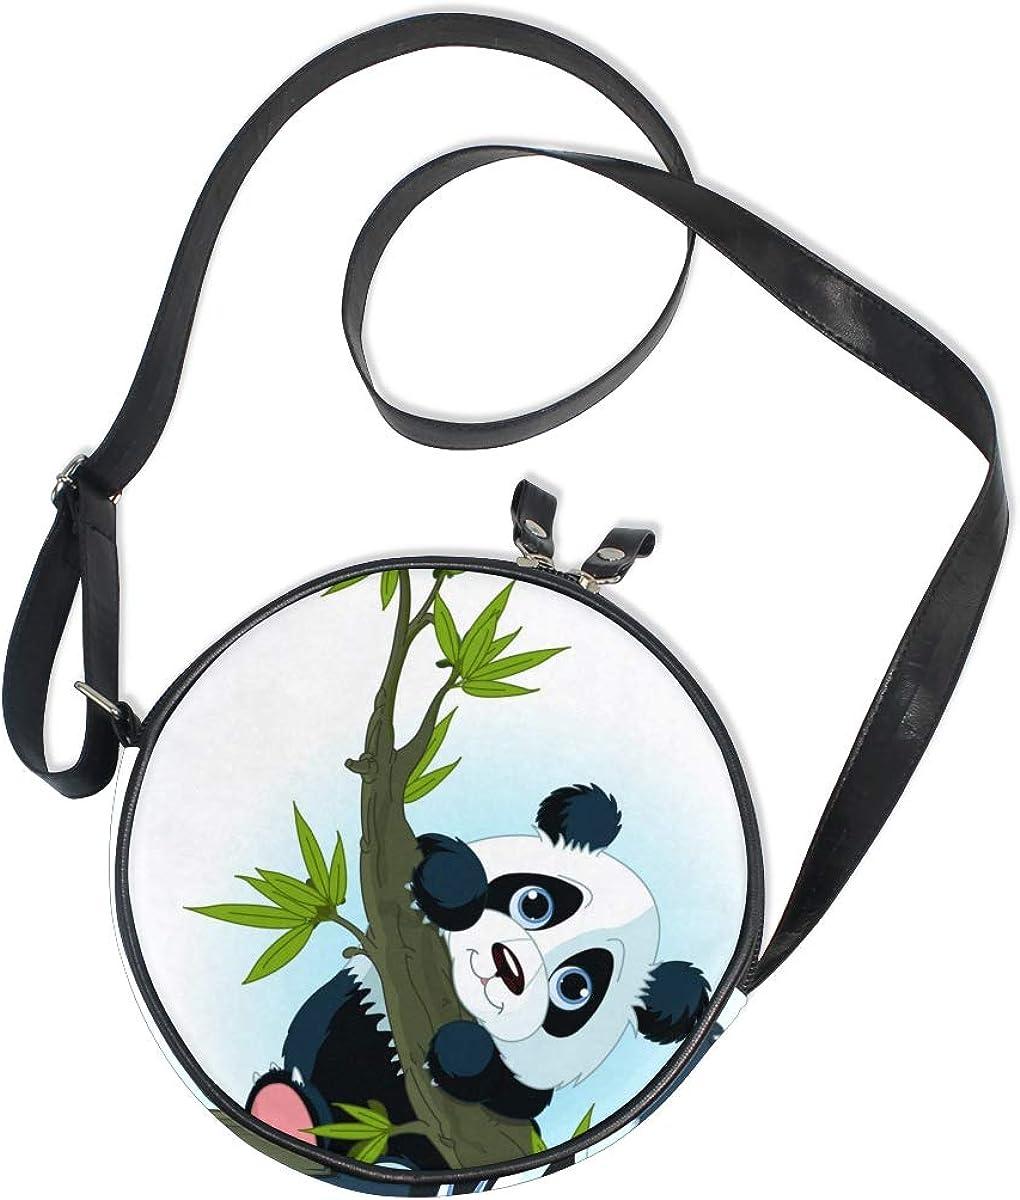 KEAKIA Giant Panda Climbing Tree Round Crossbody Bag Shoulder Sling Bag Handbag Purse Satchel Shoulder Bag for Kids Women